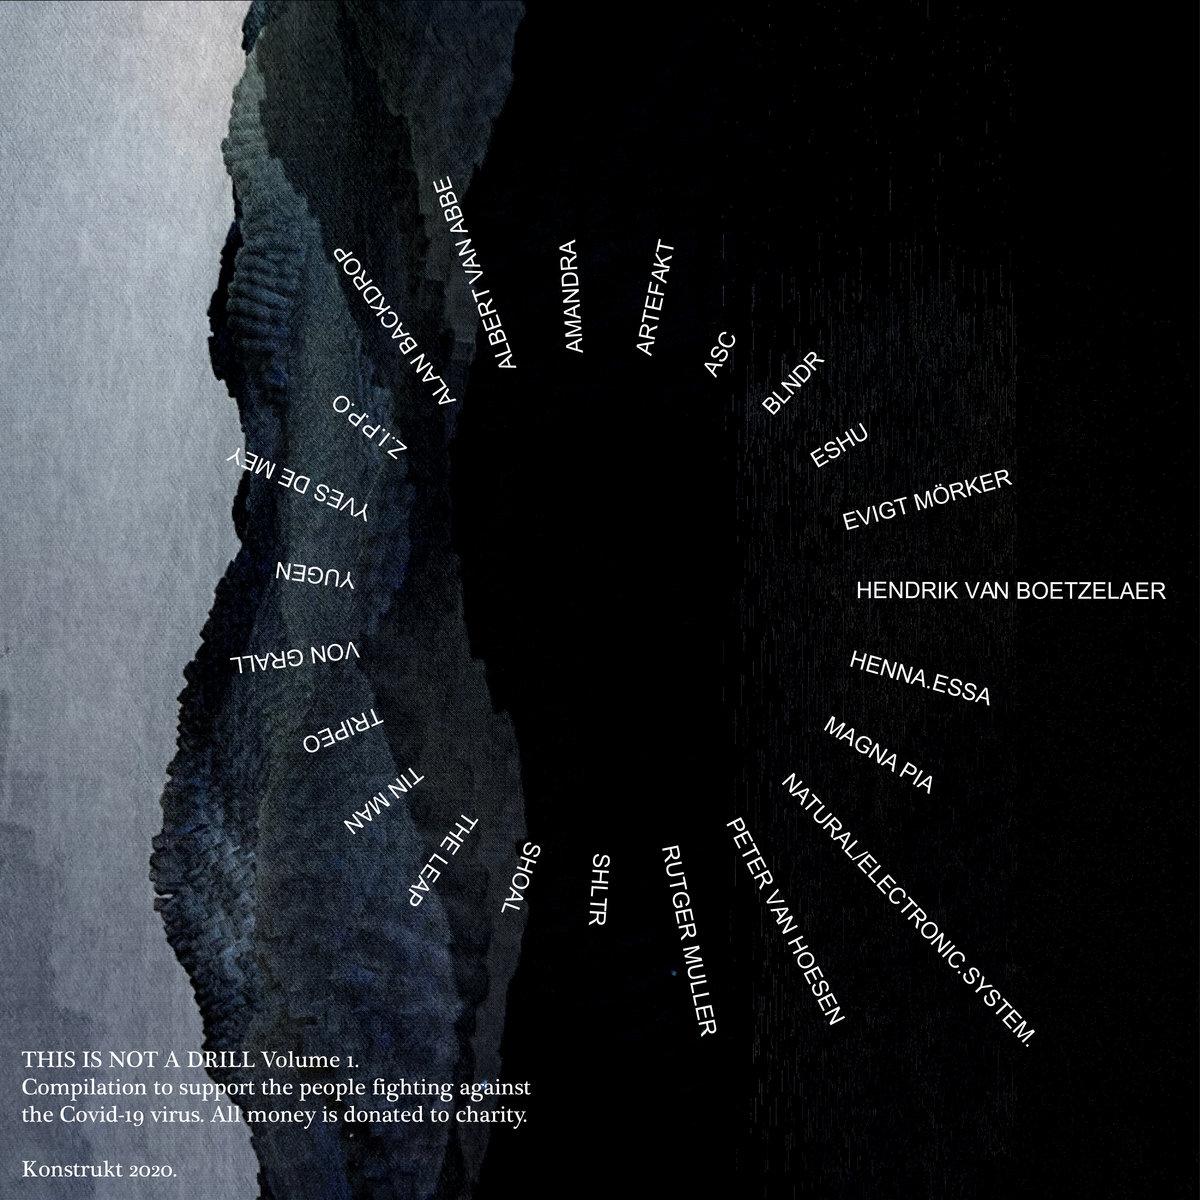 23 Track Konstrukt Compilation To Support Rode Kruis Netherlands in Battle Against Coronavirus Pandemic